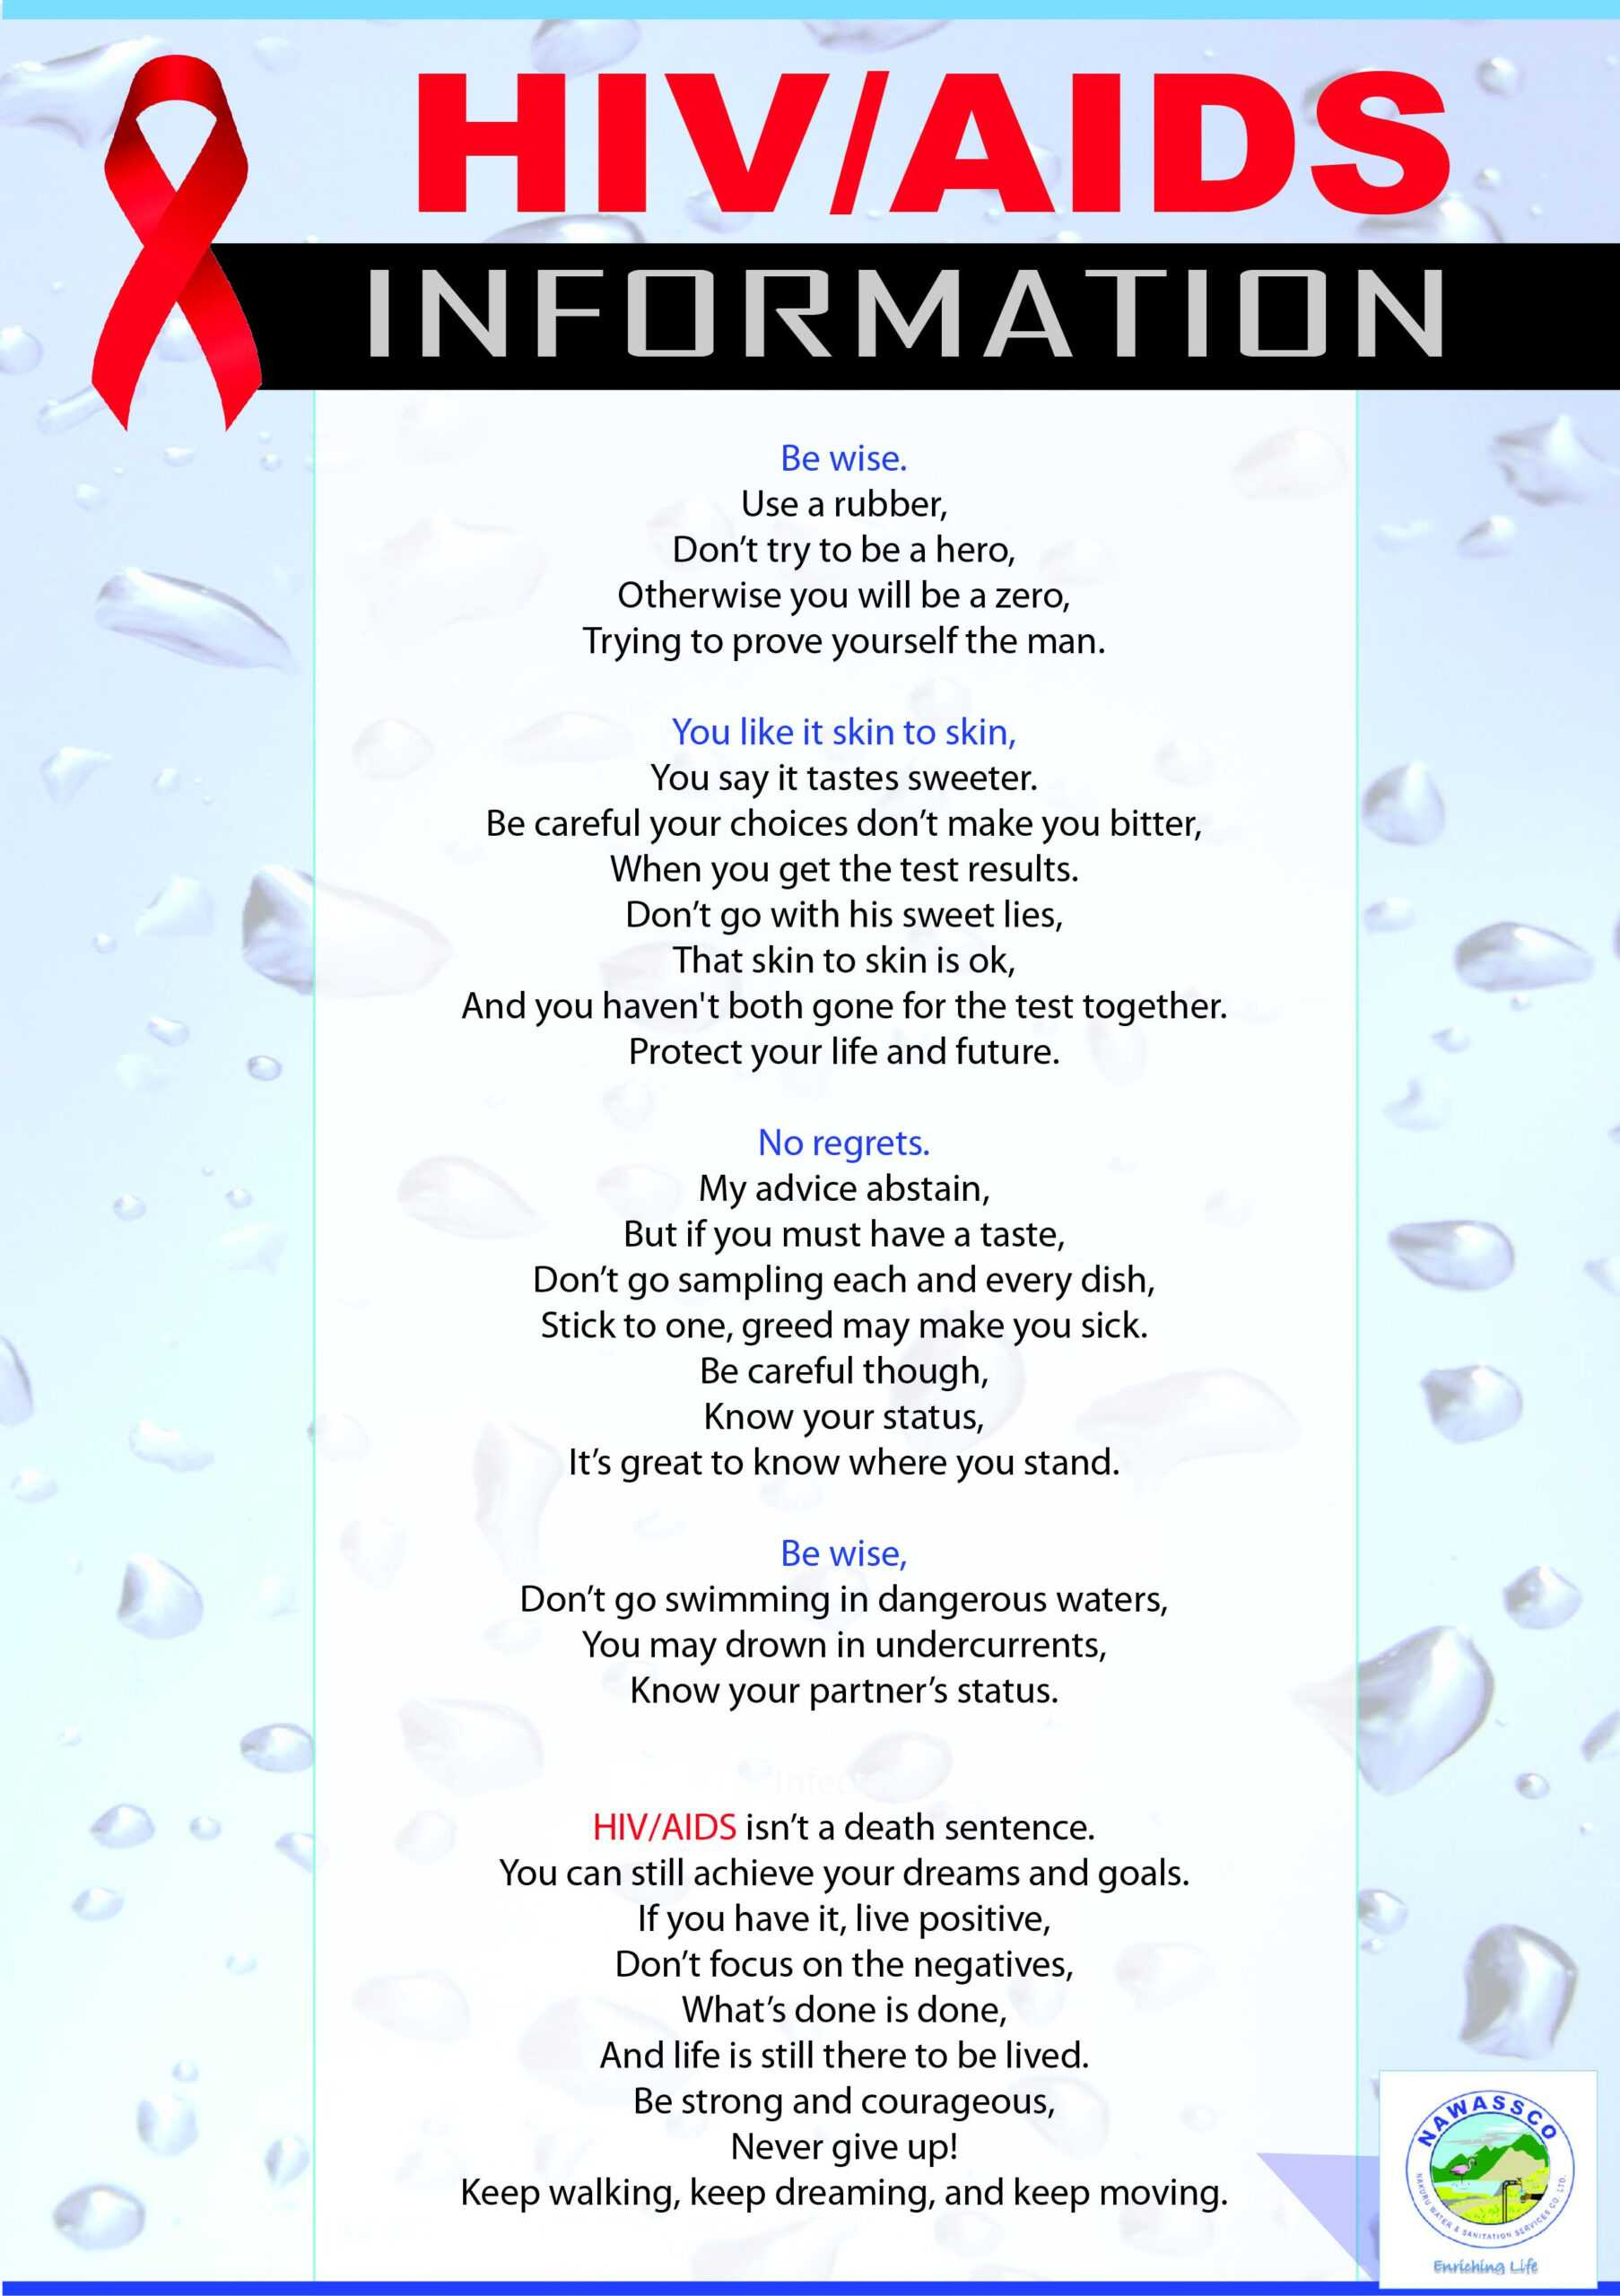 Hiv Aids Brochure Templates - Carlynstudio within Hiv Aids Brochure Templates